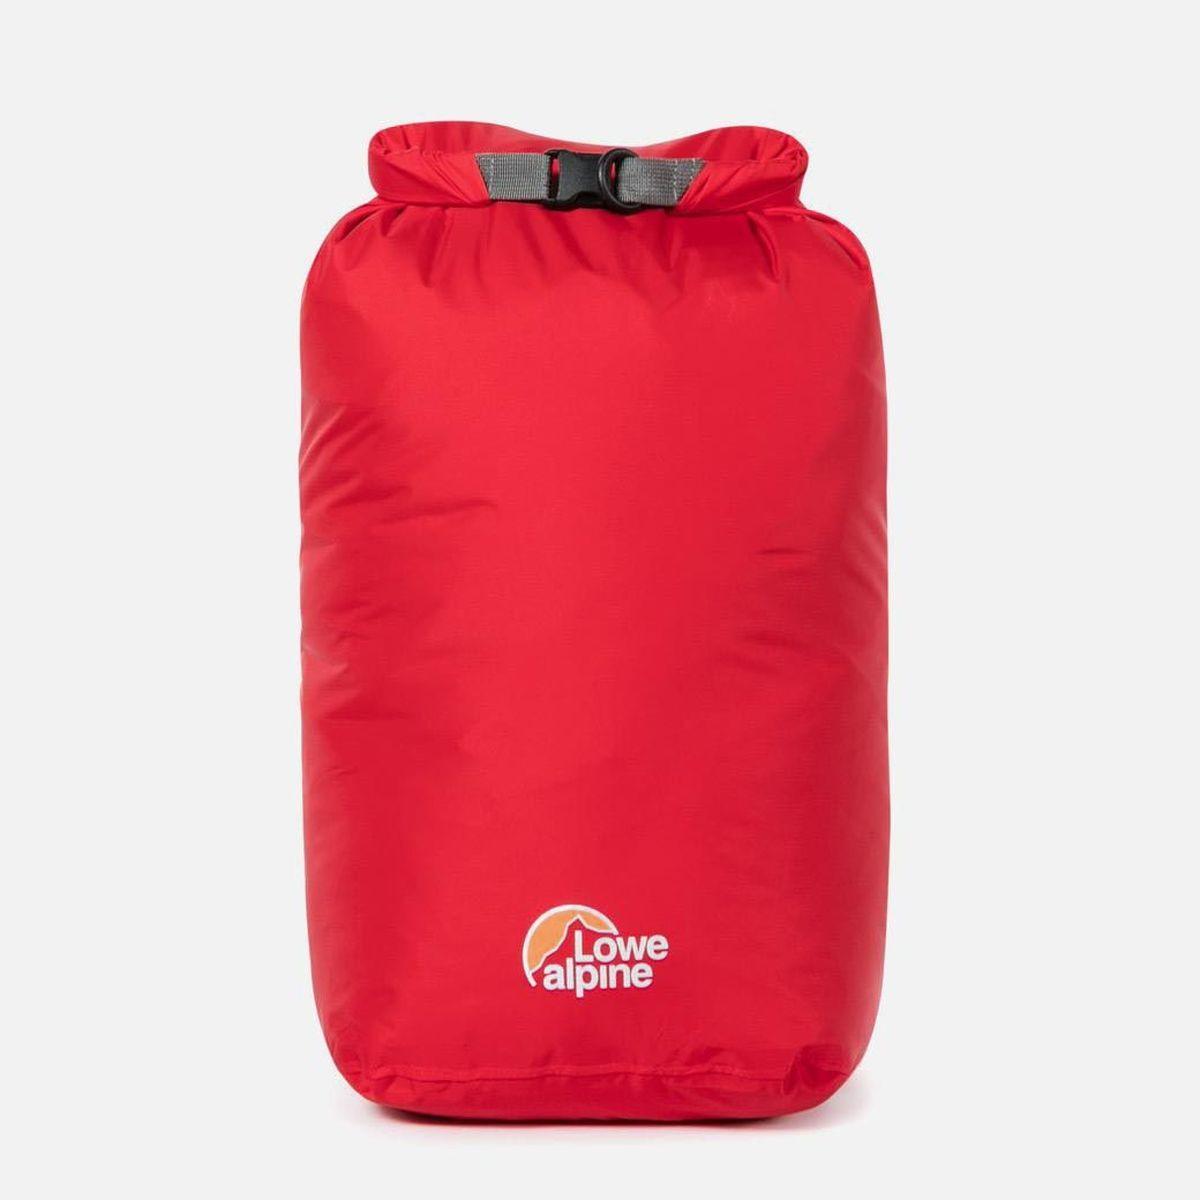 Гермочехол Lowe Alpine Drysack, FAE-55-L, красный, размер L